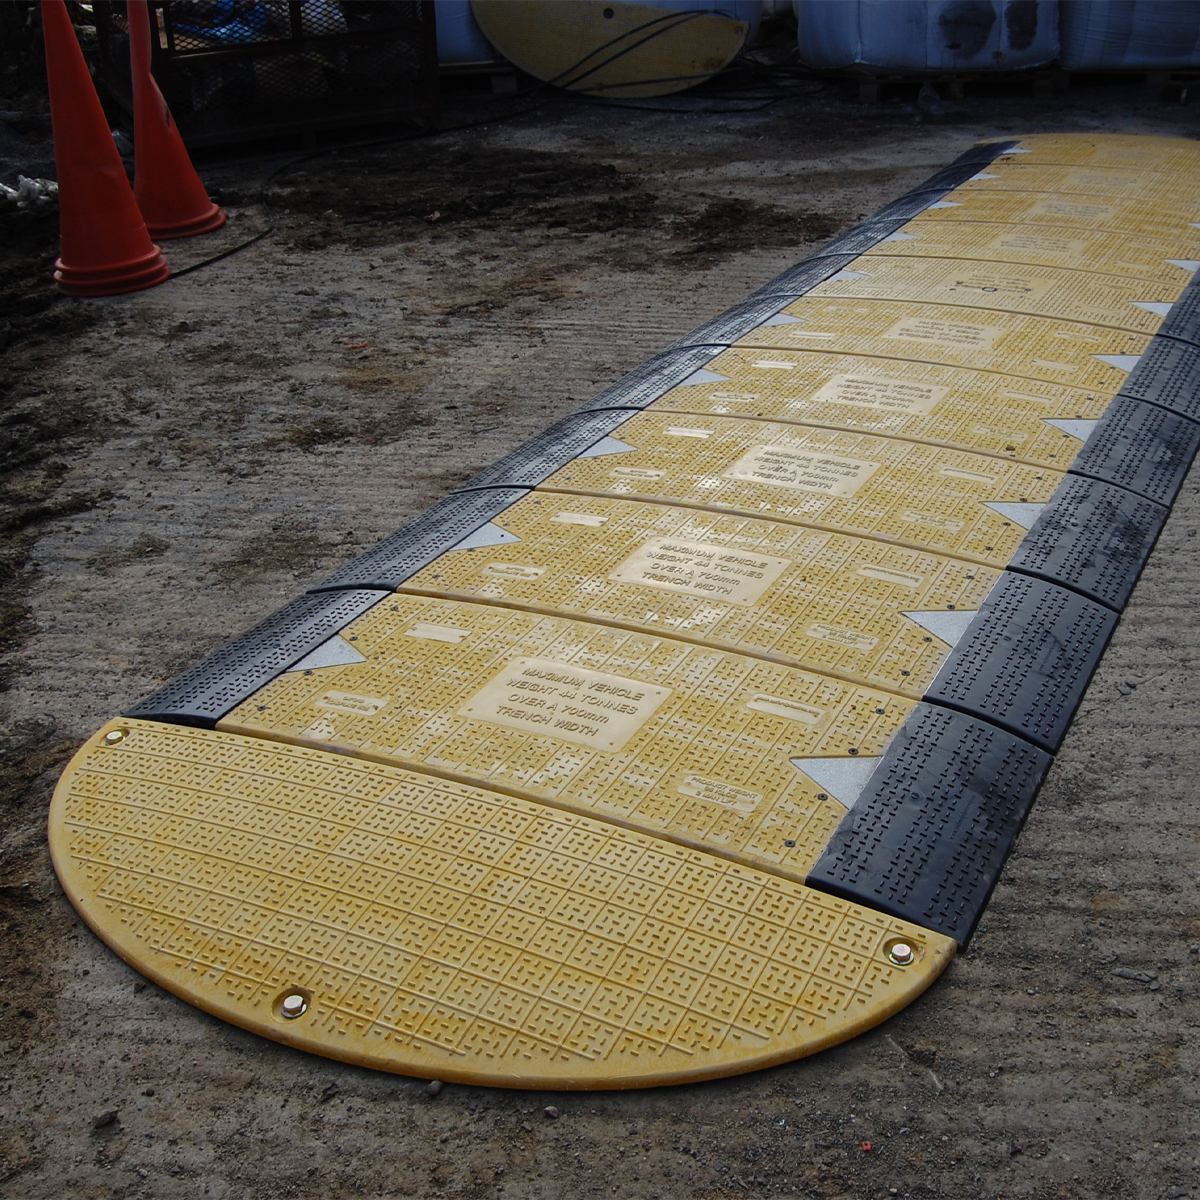 LowPro 15/05 Road Plate